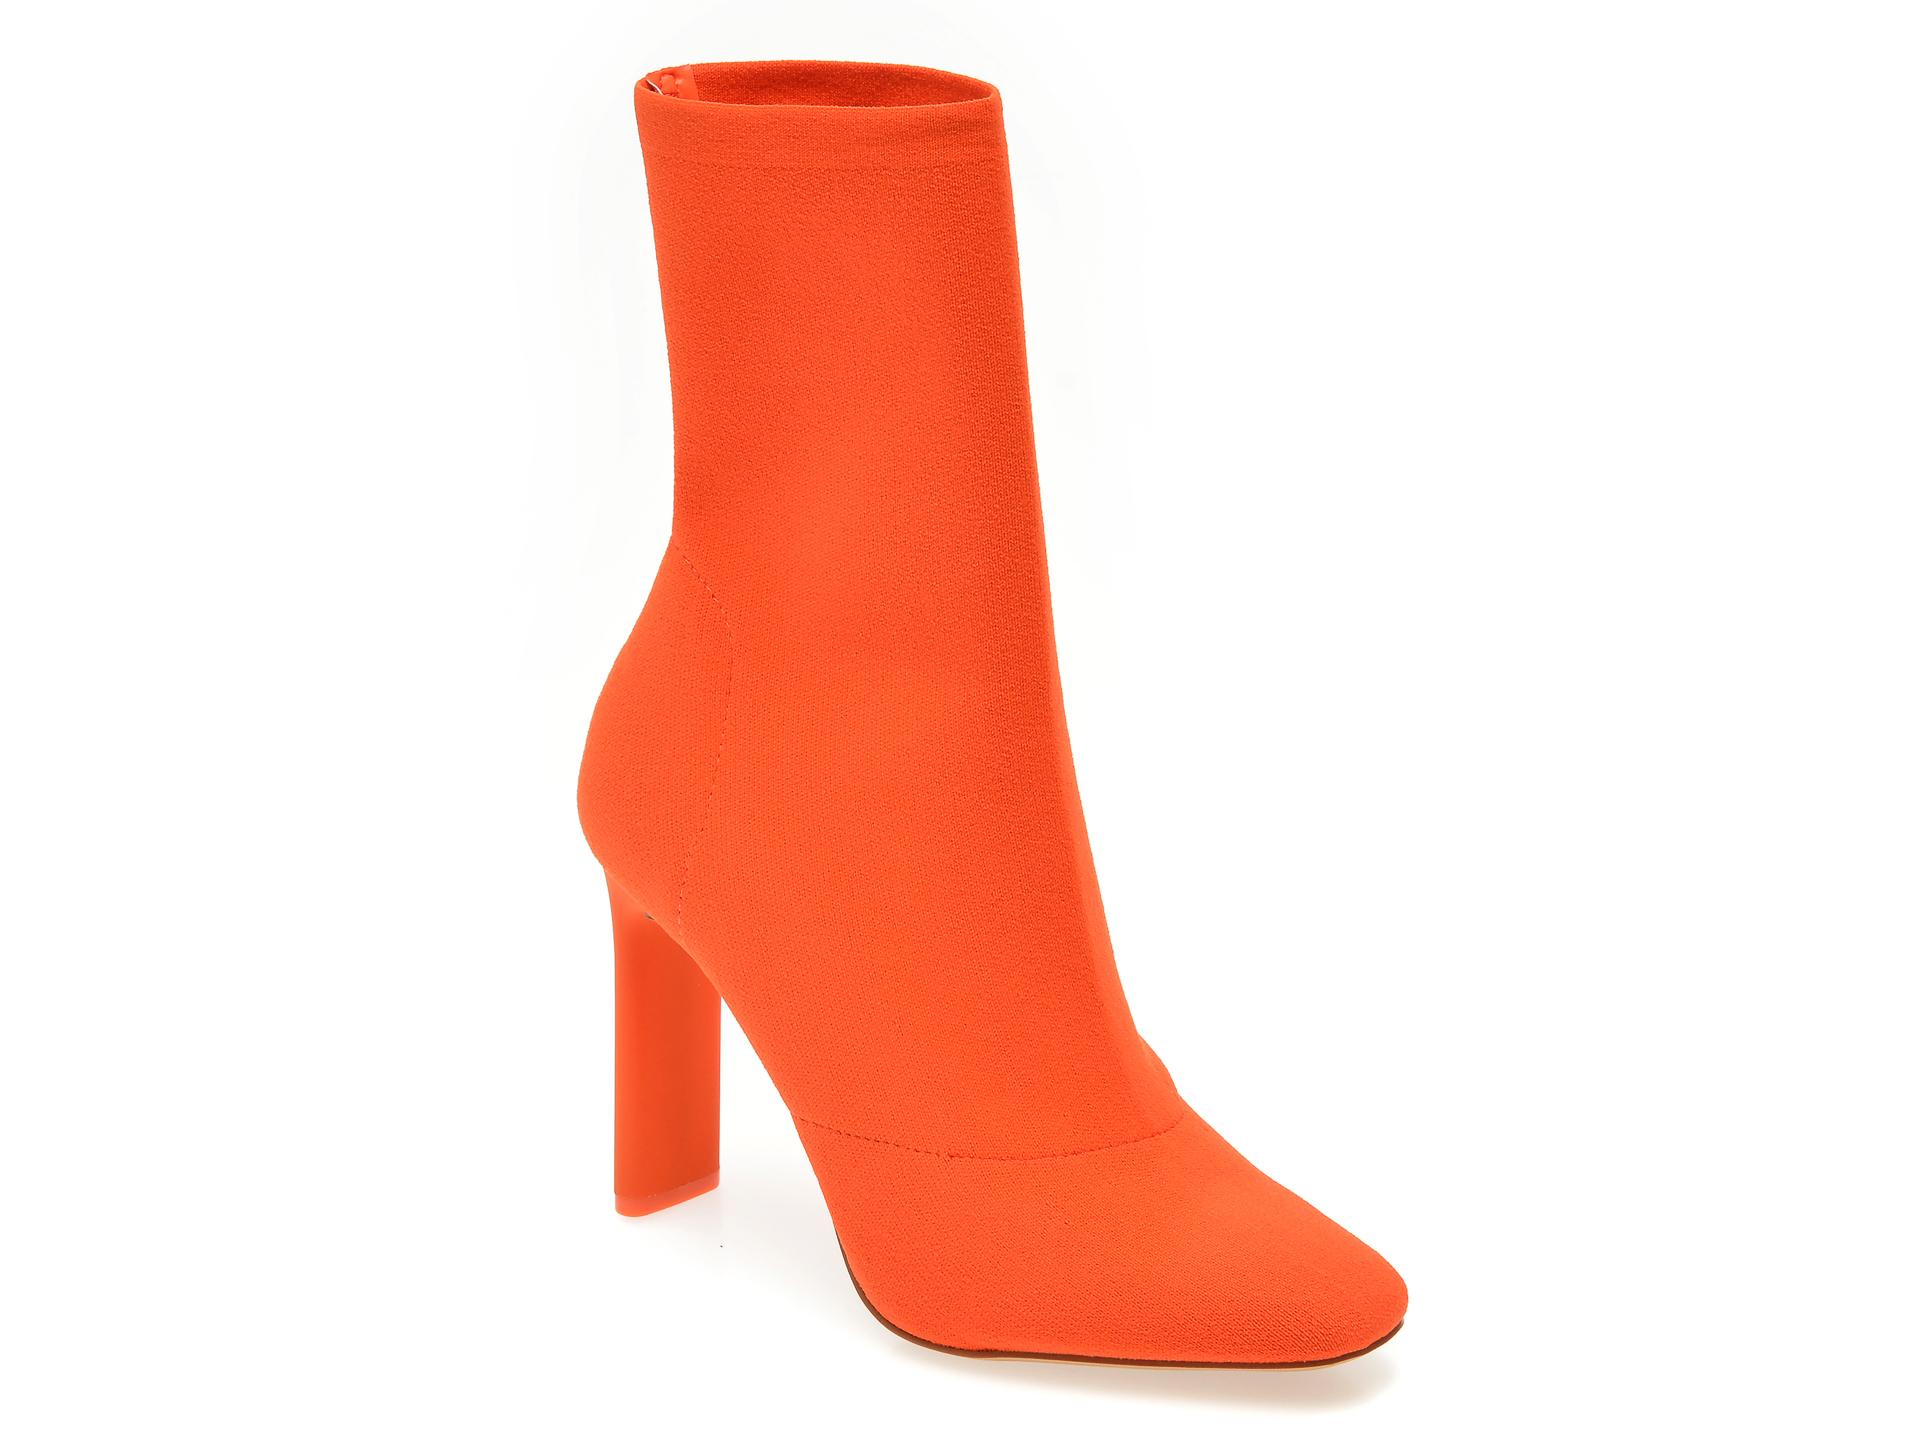 Ghete ALDO portocalii, Delylah600, din material textil imagine otter.ro 2021